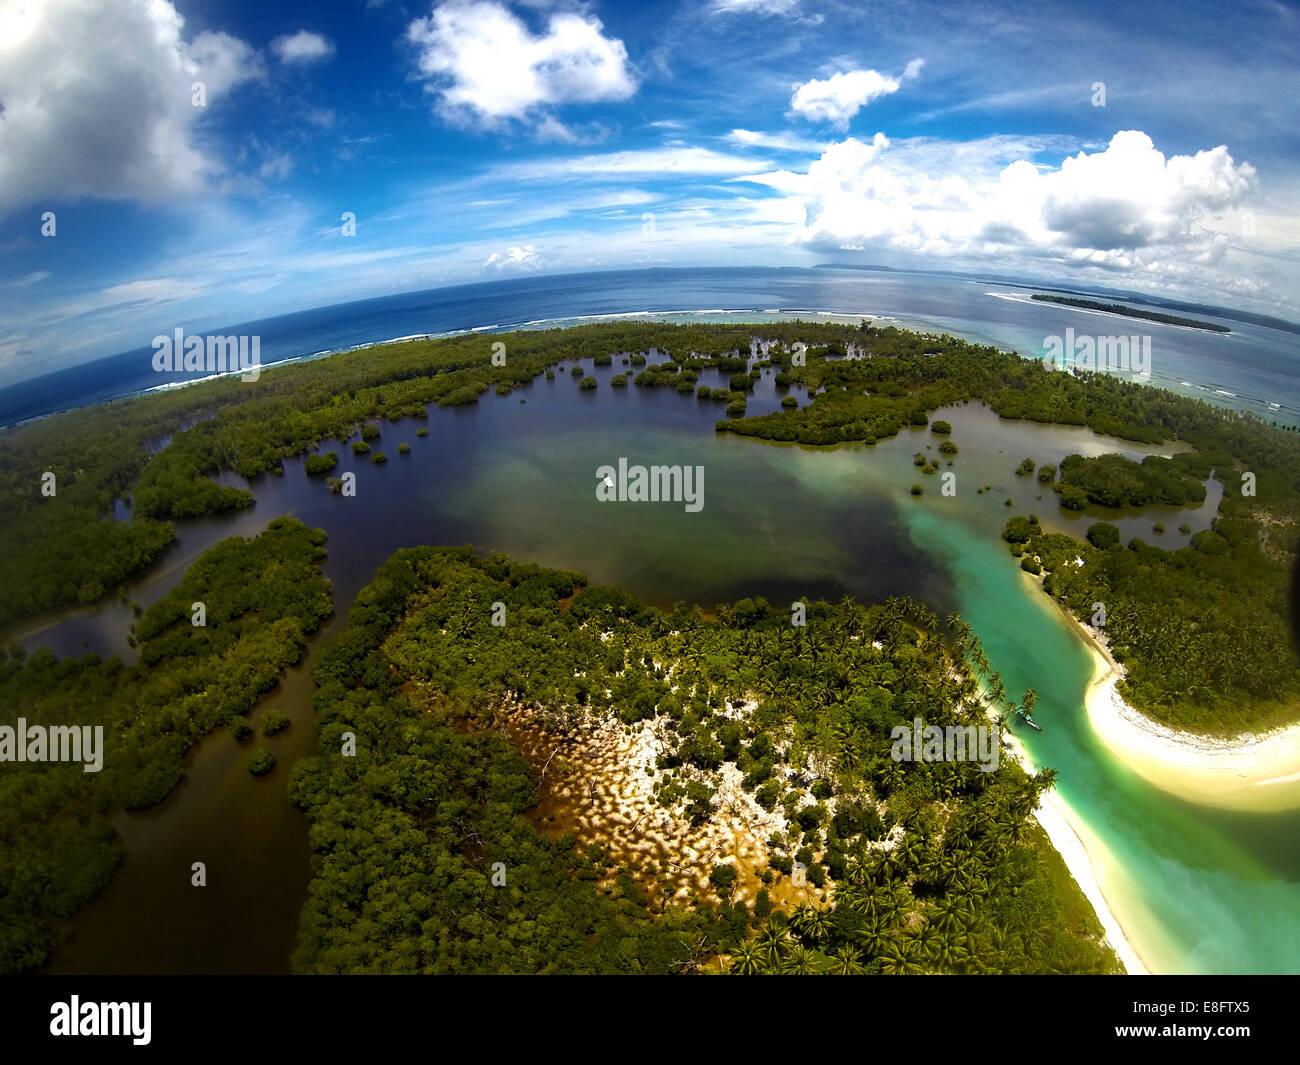 Indonesia, View of Mentawai Islands - Stock Image